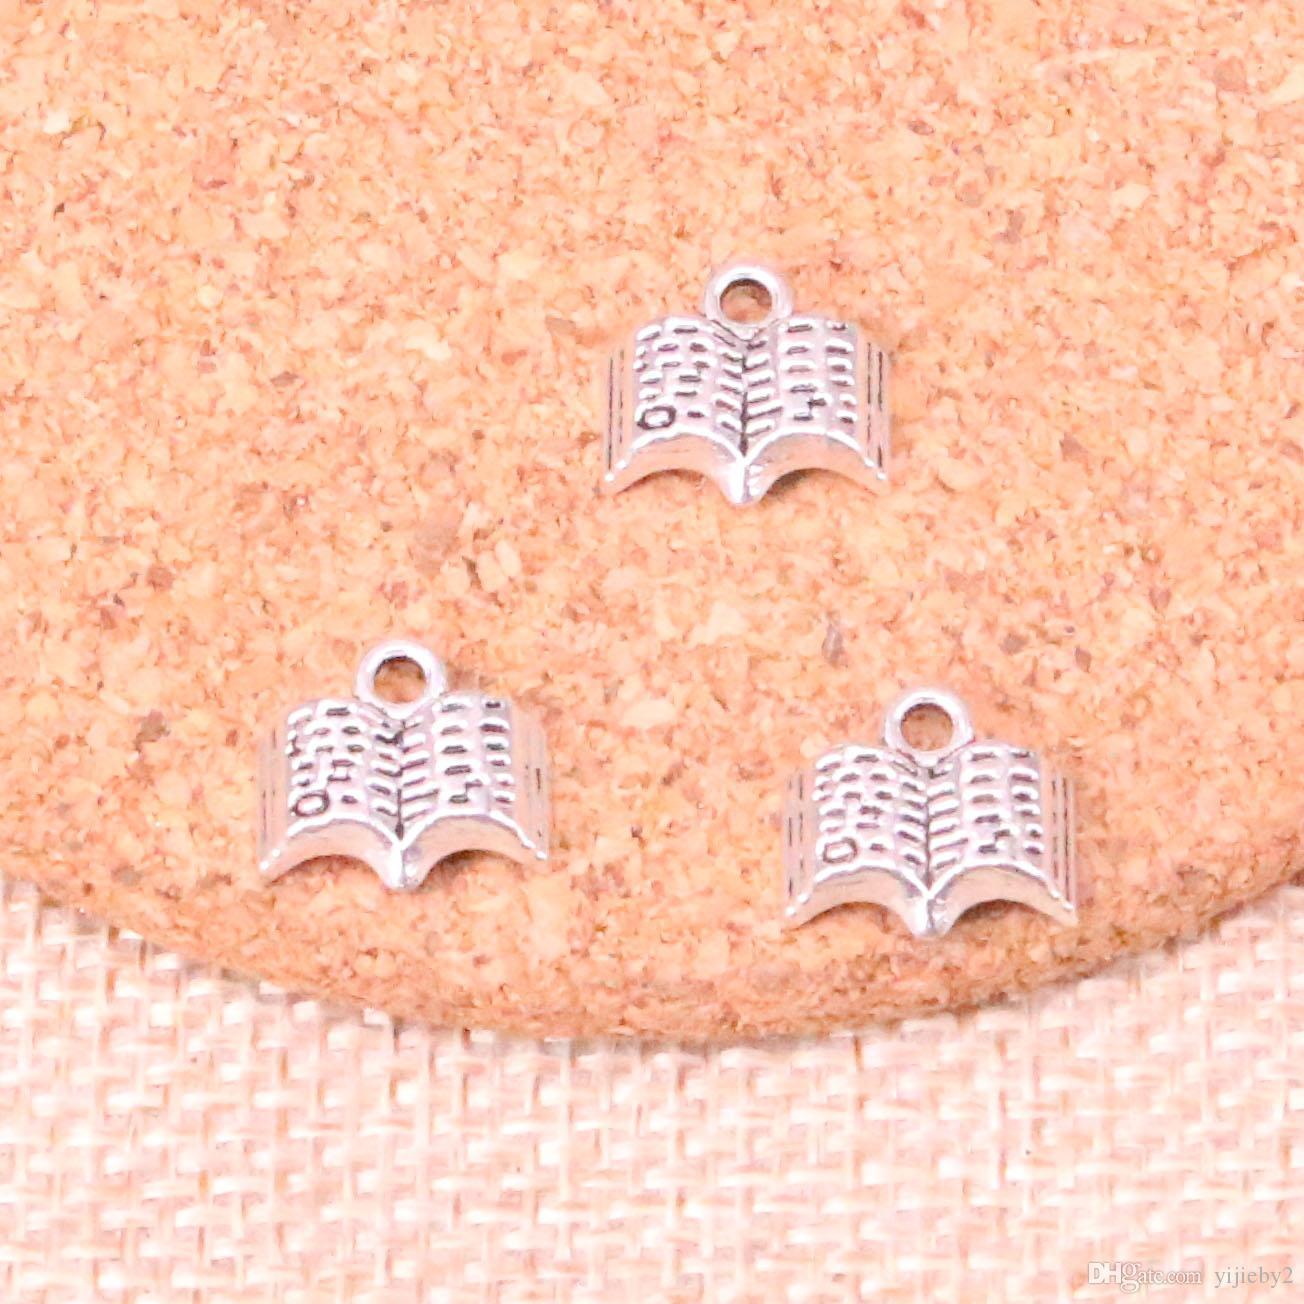 233 stücke Antike Splitter öffnen Bibel buch Charme Anhänger DIY Halskette Armband Armreif Erkenntnisse 11mm